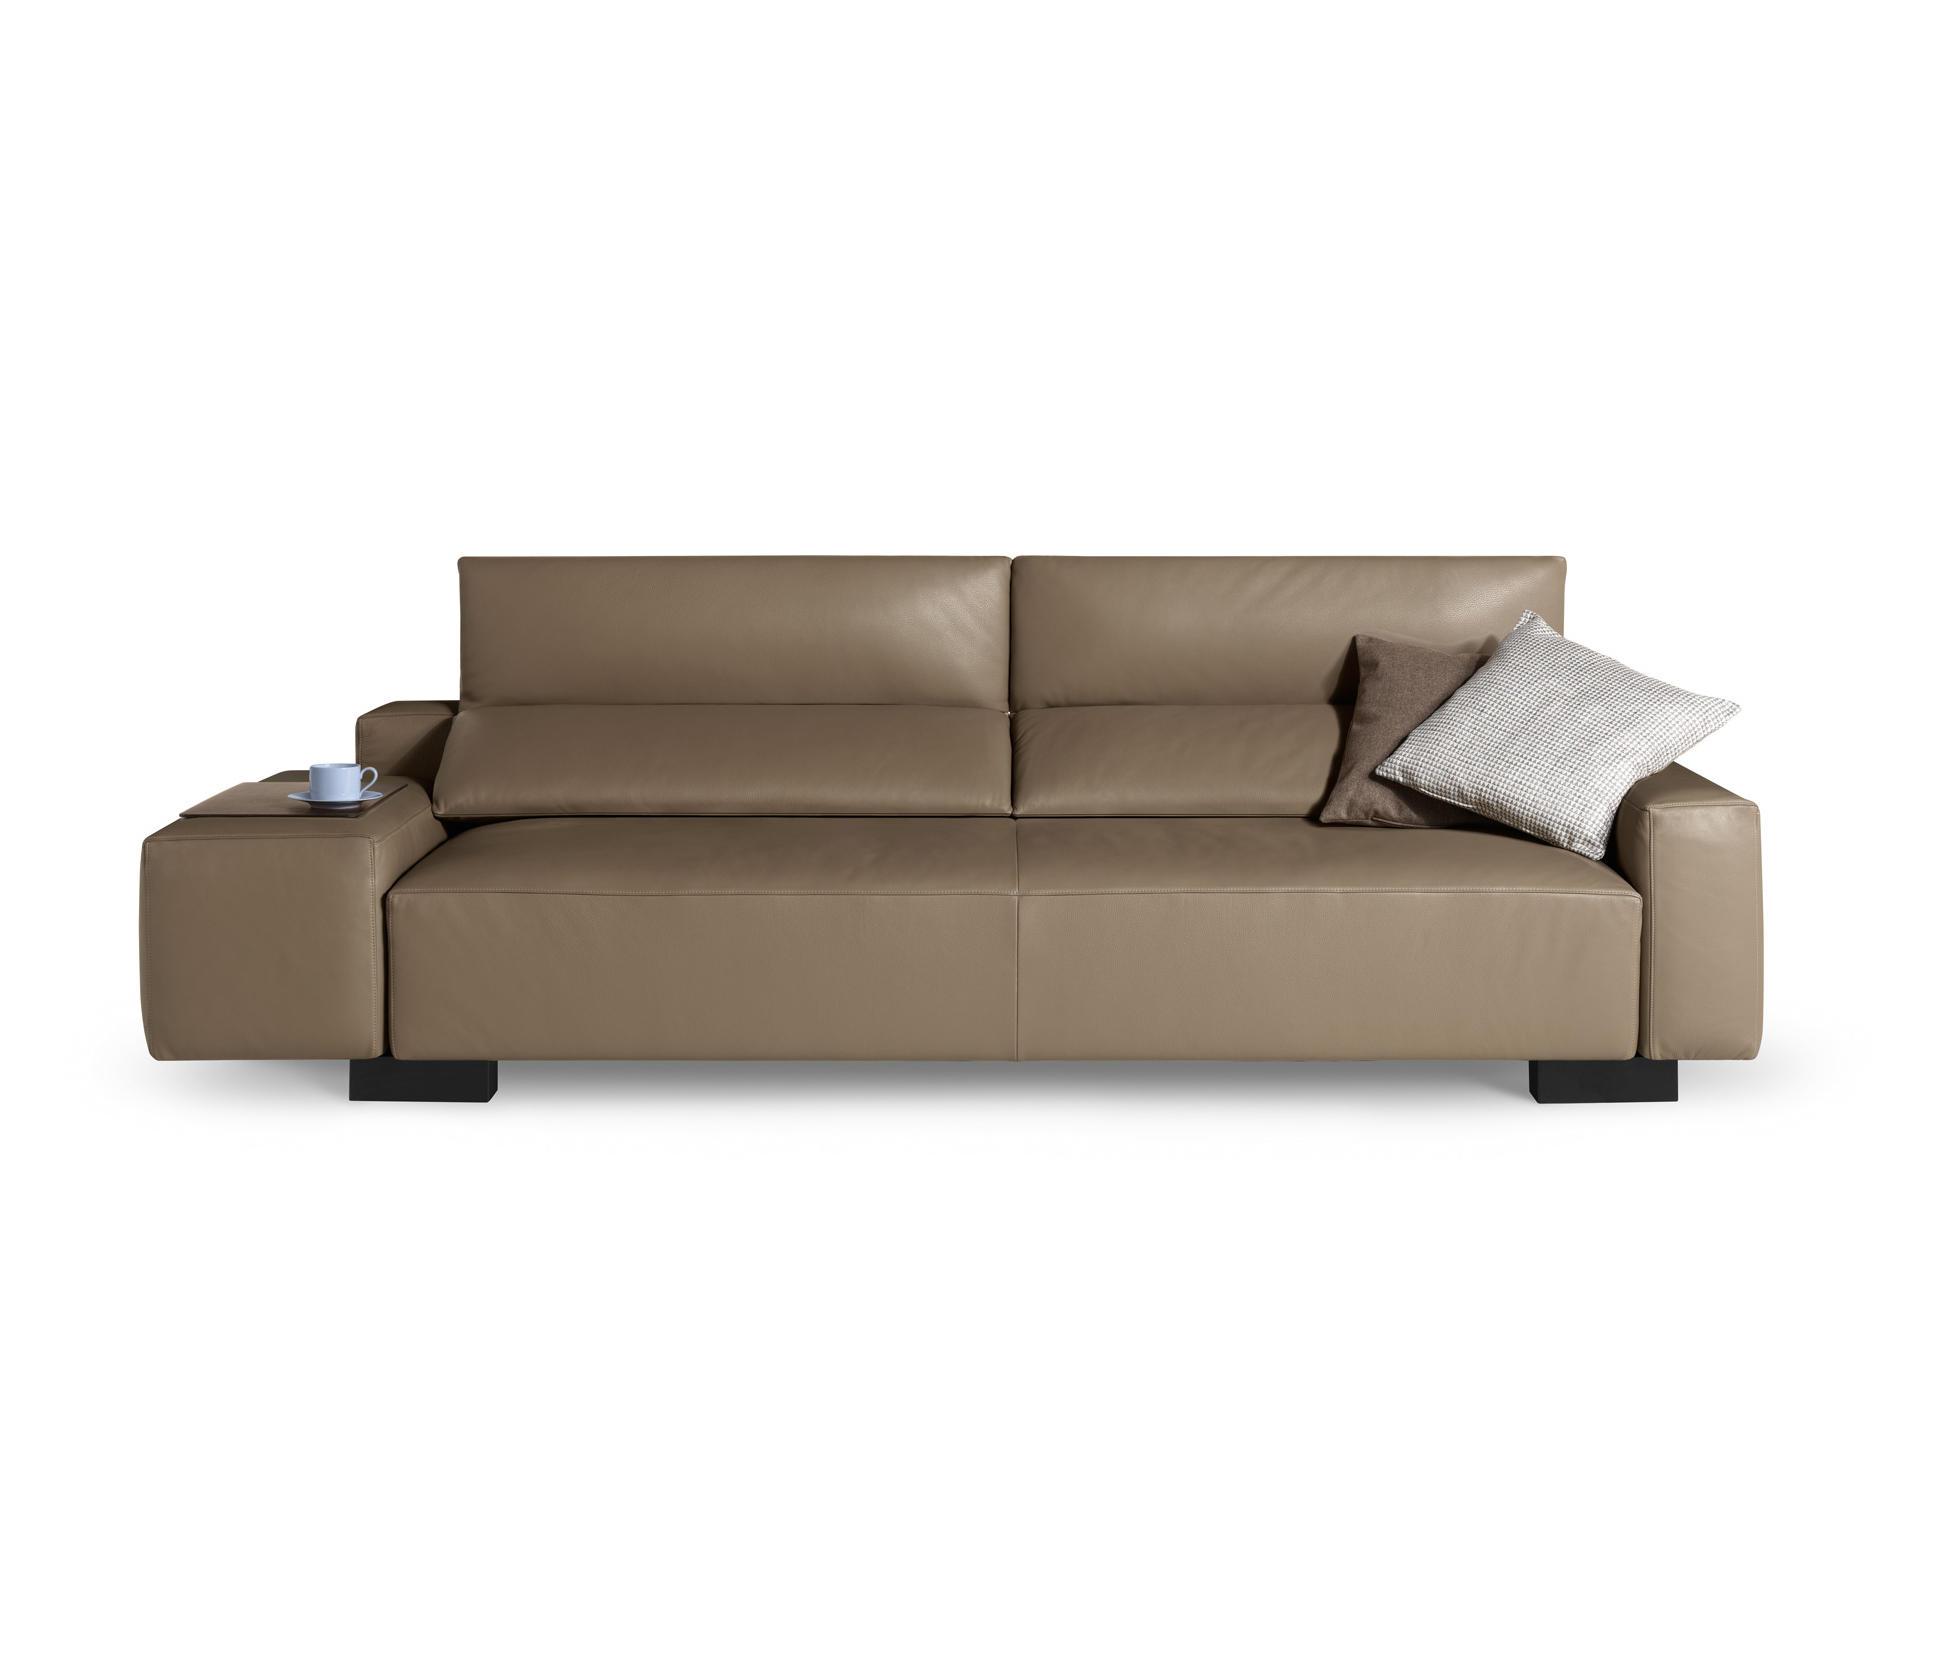 Poltrona Studio.Bullit Sofas From Poltrona Frau Architonic